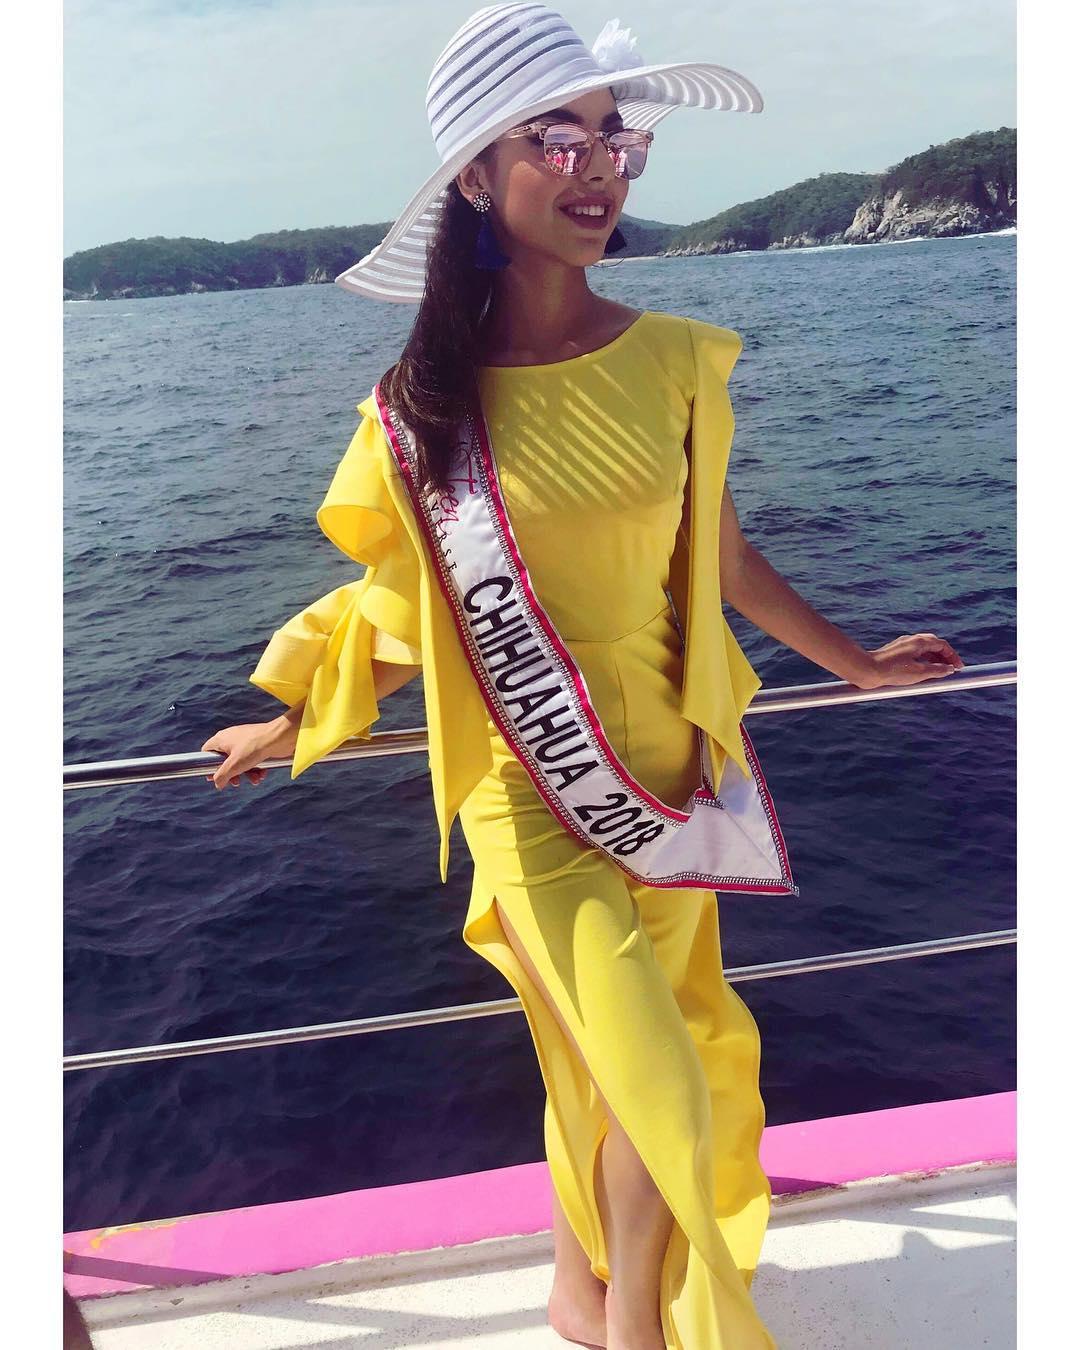 frida barron, miss teen universe riviera maya 2019. - Página 2 46566510